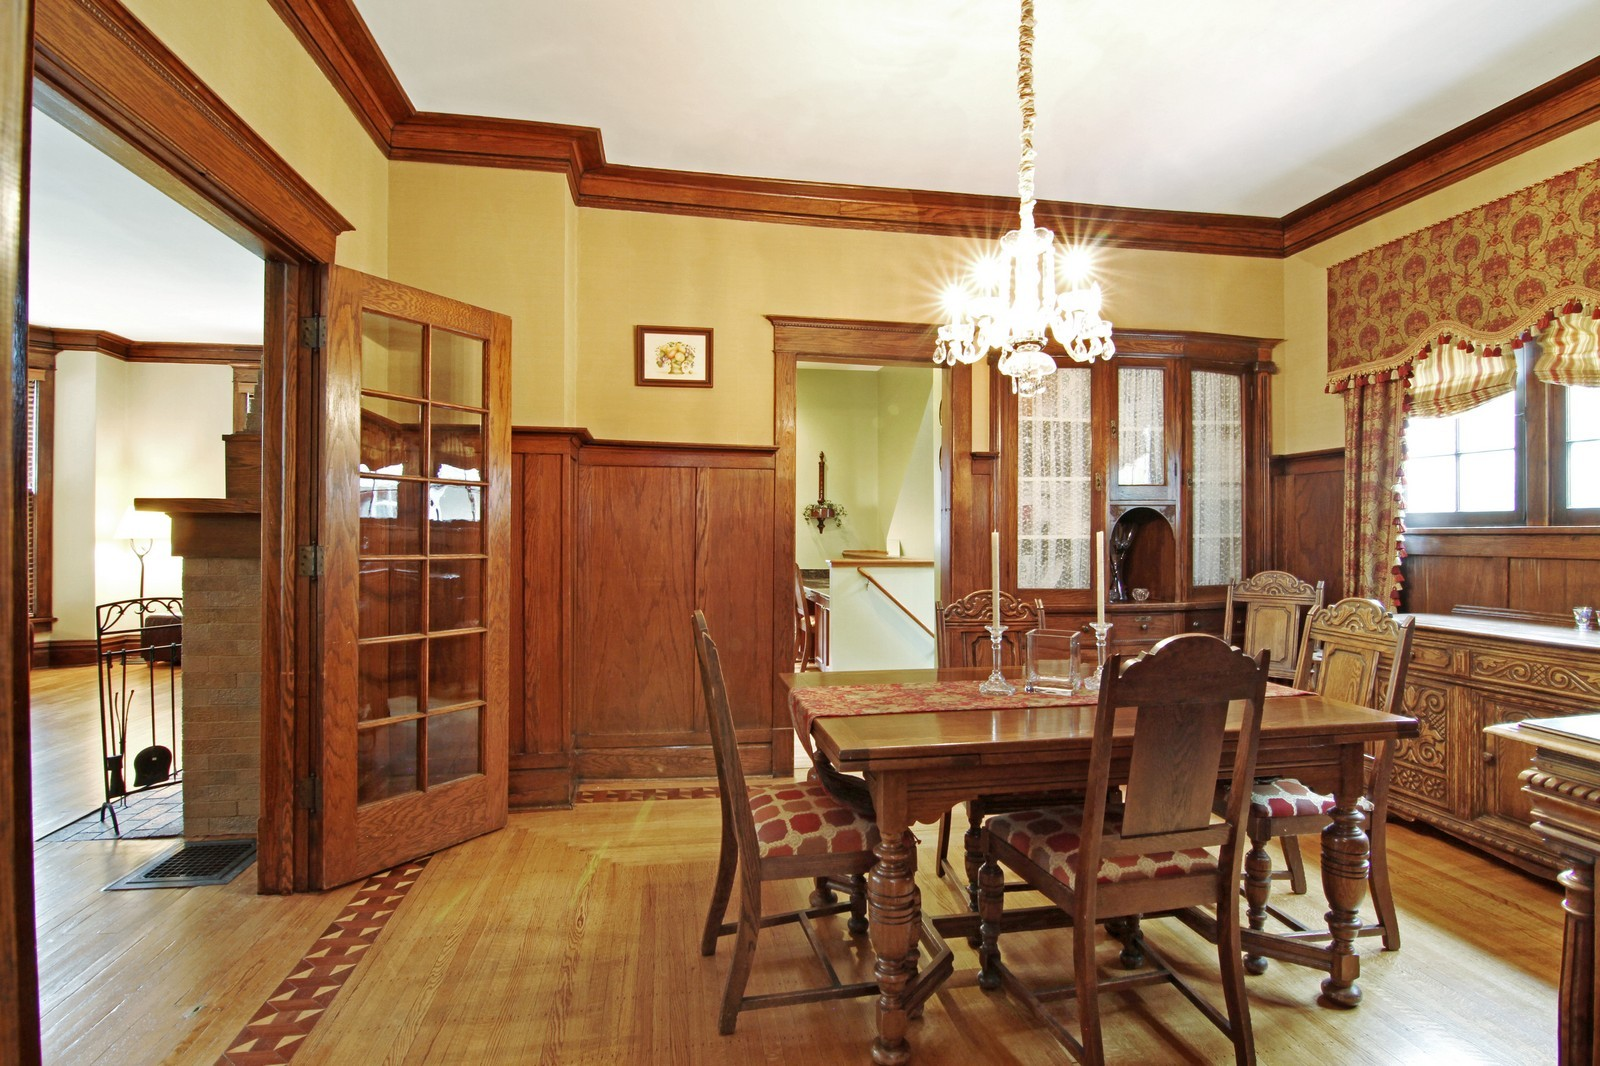 Real Estate Photography - 228 LaGrange Rd, La Grange, IL, 60525 - Kitchen / Dining Room